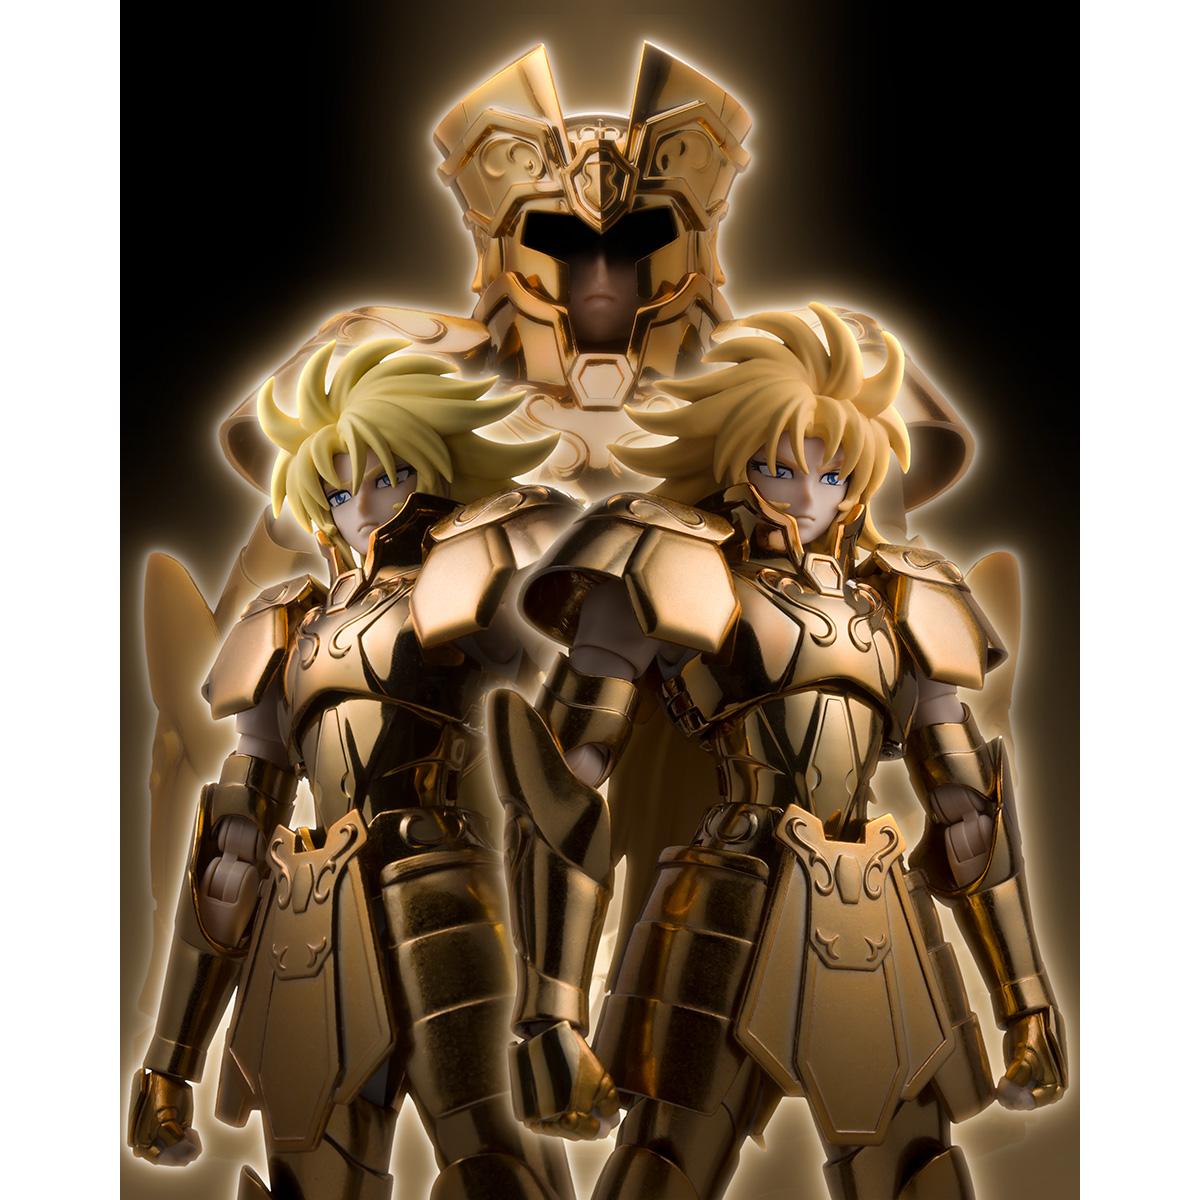 Saint Cloth Myth EX GEMINI SAGA KANON -ORIGINAL COLOR EDITION-【Second Offer】